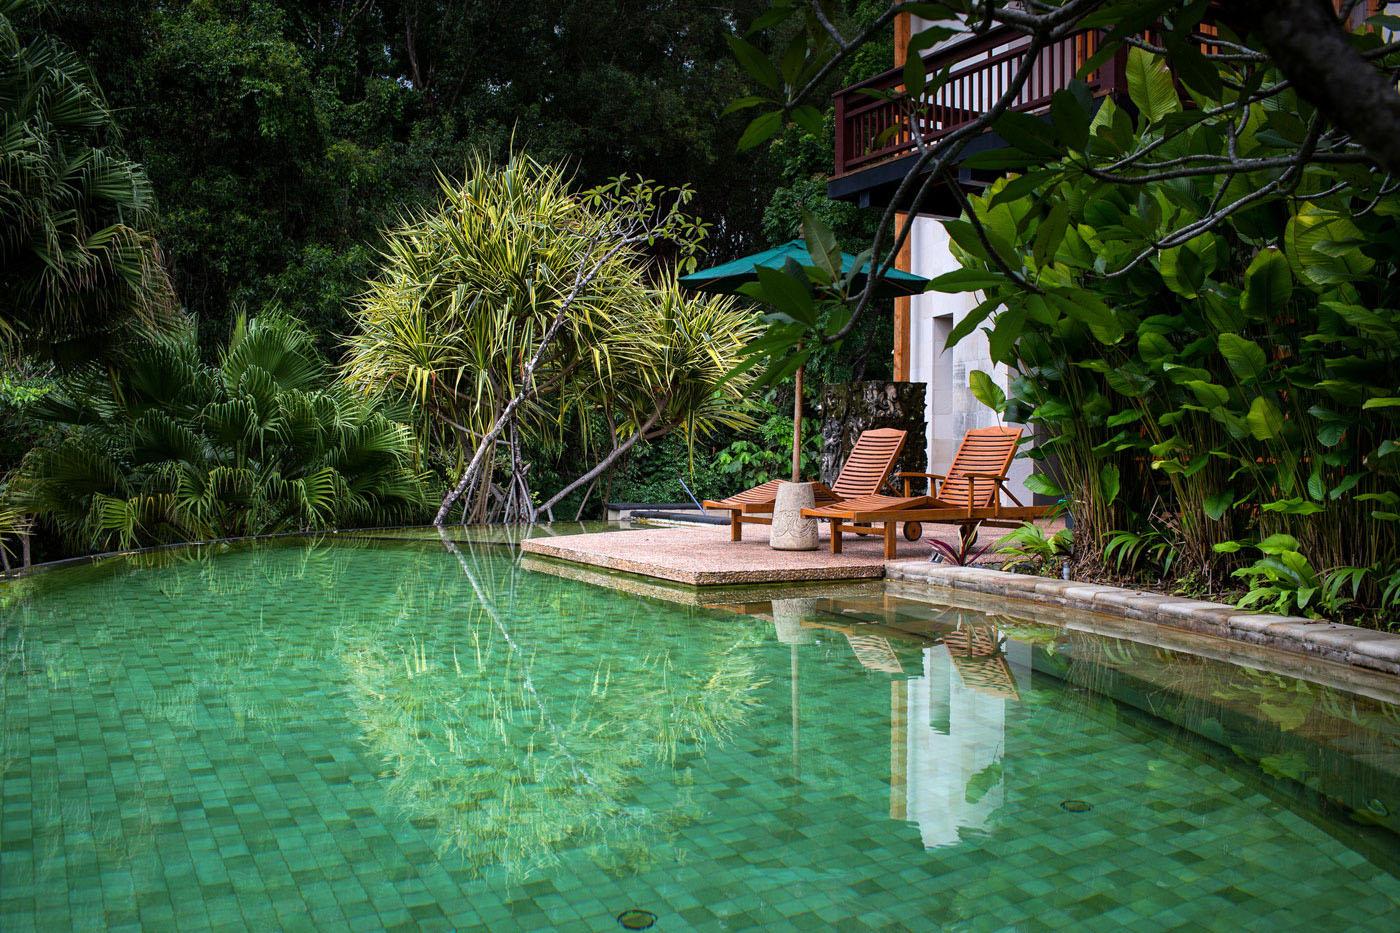 teak kitchen chairs valance patterns balinese-style bungalow in kuala lumpur | idesignarch ...